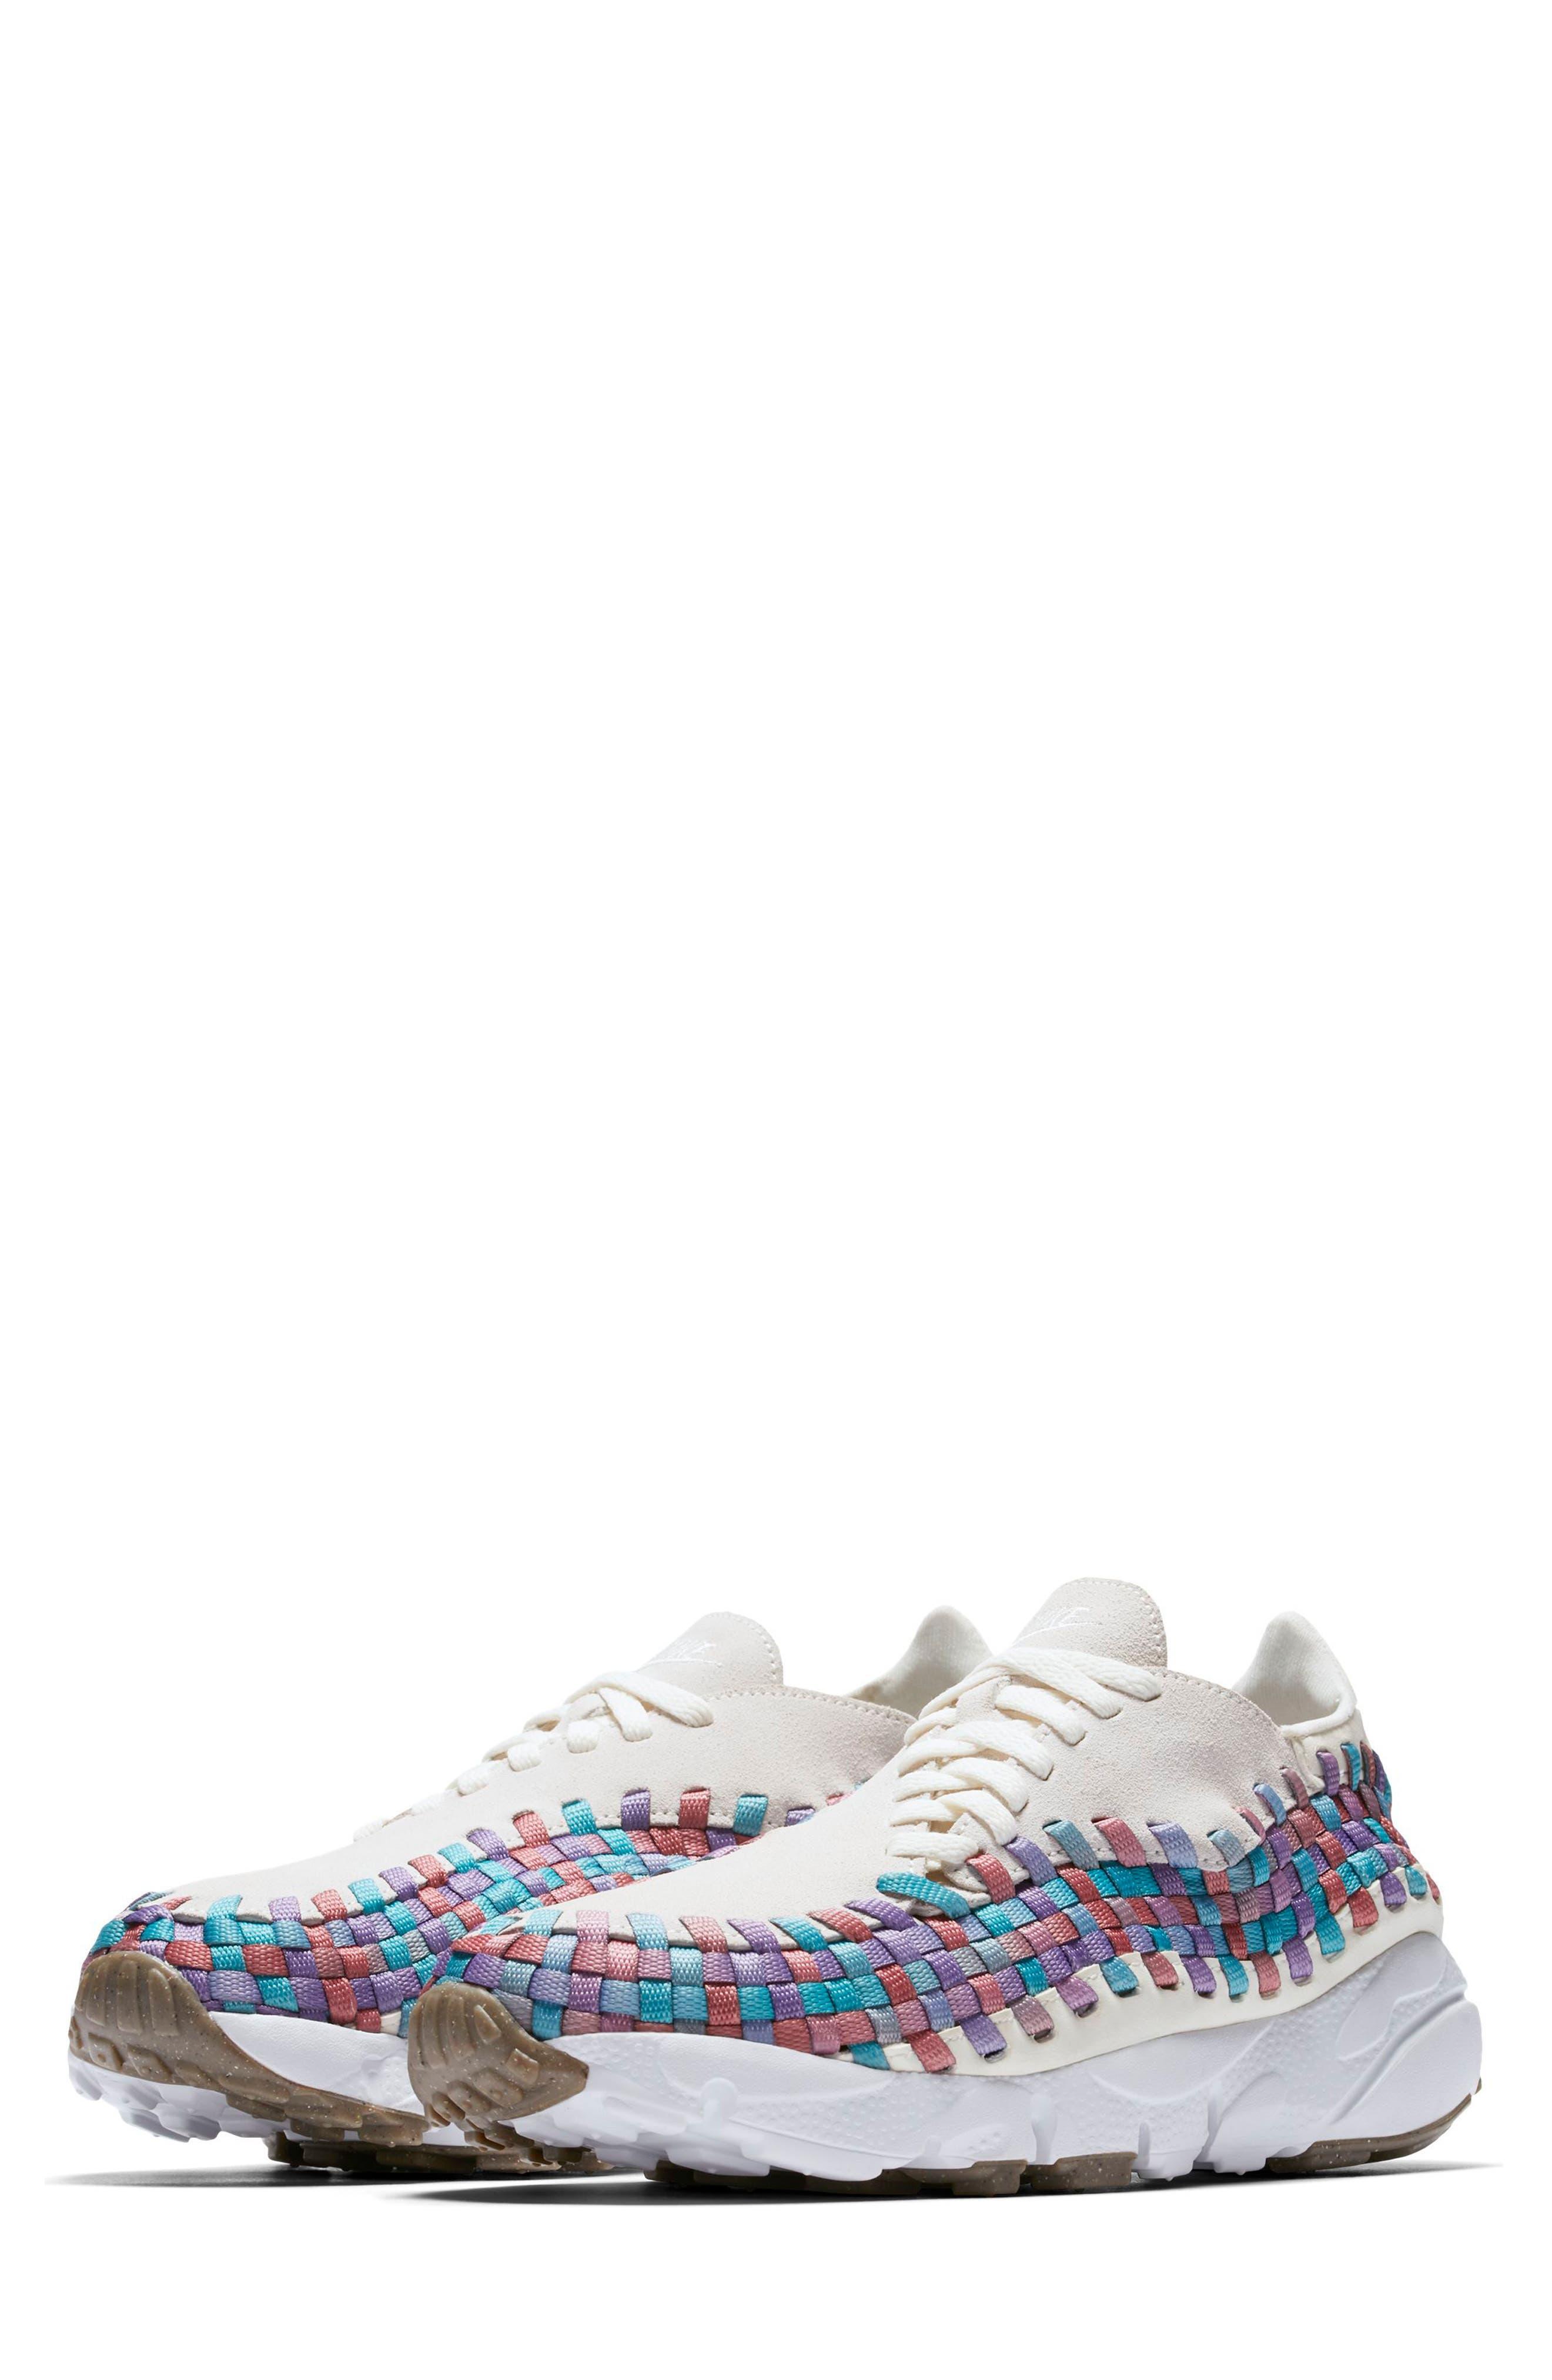 Air Footscape Woven Sneaker,                             Main thumbnail 1, color,                             Sail/ White/ Red/ Teal/ Gum